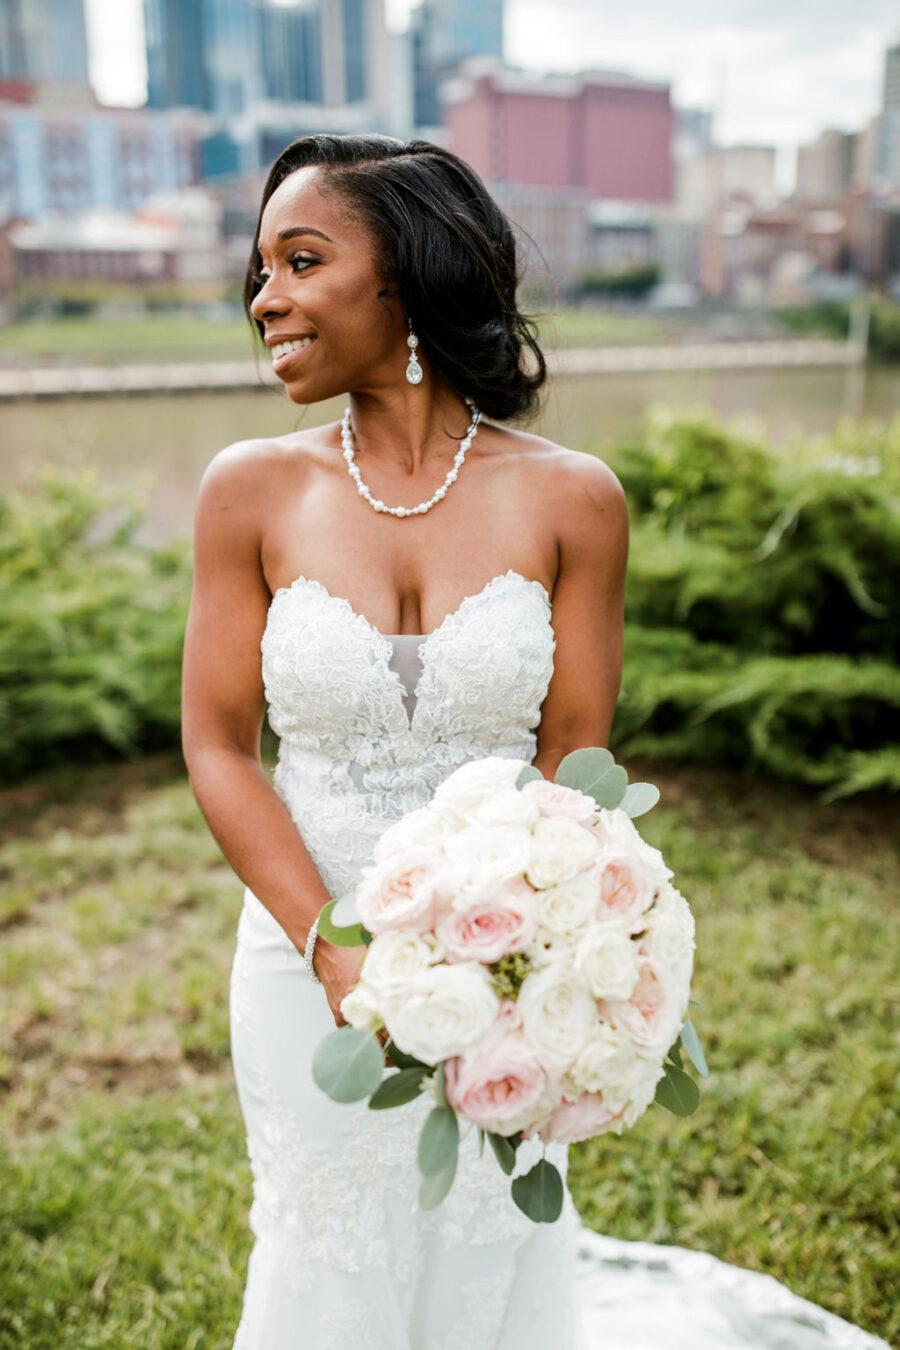 Bridal portrait by John Myers Photography | Nashville Bride Guide